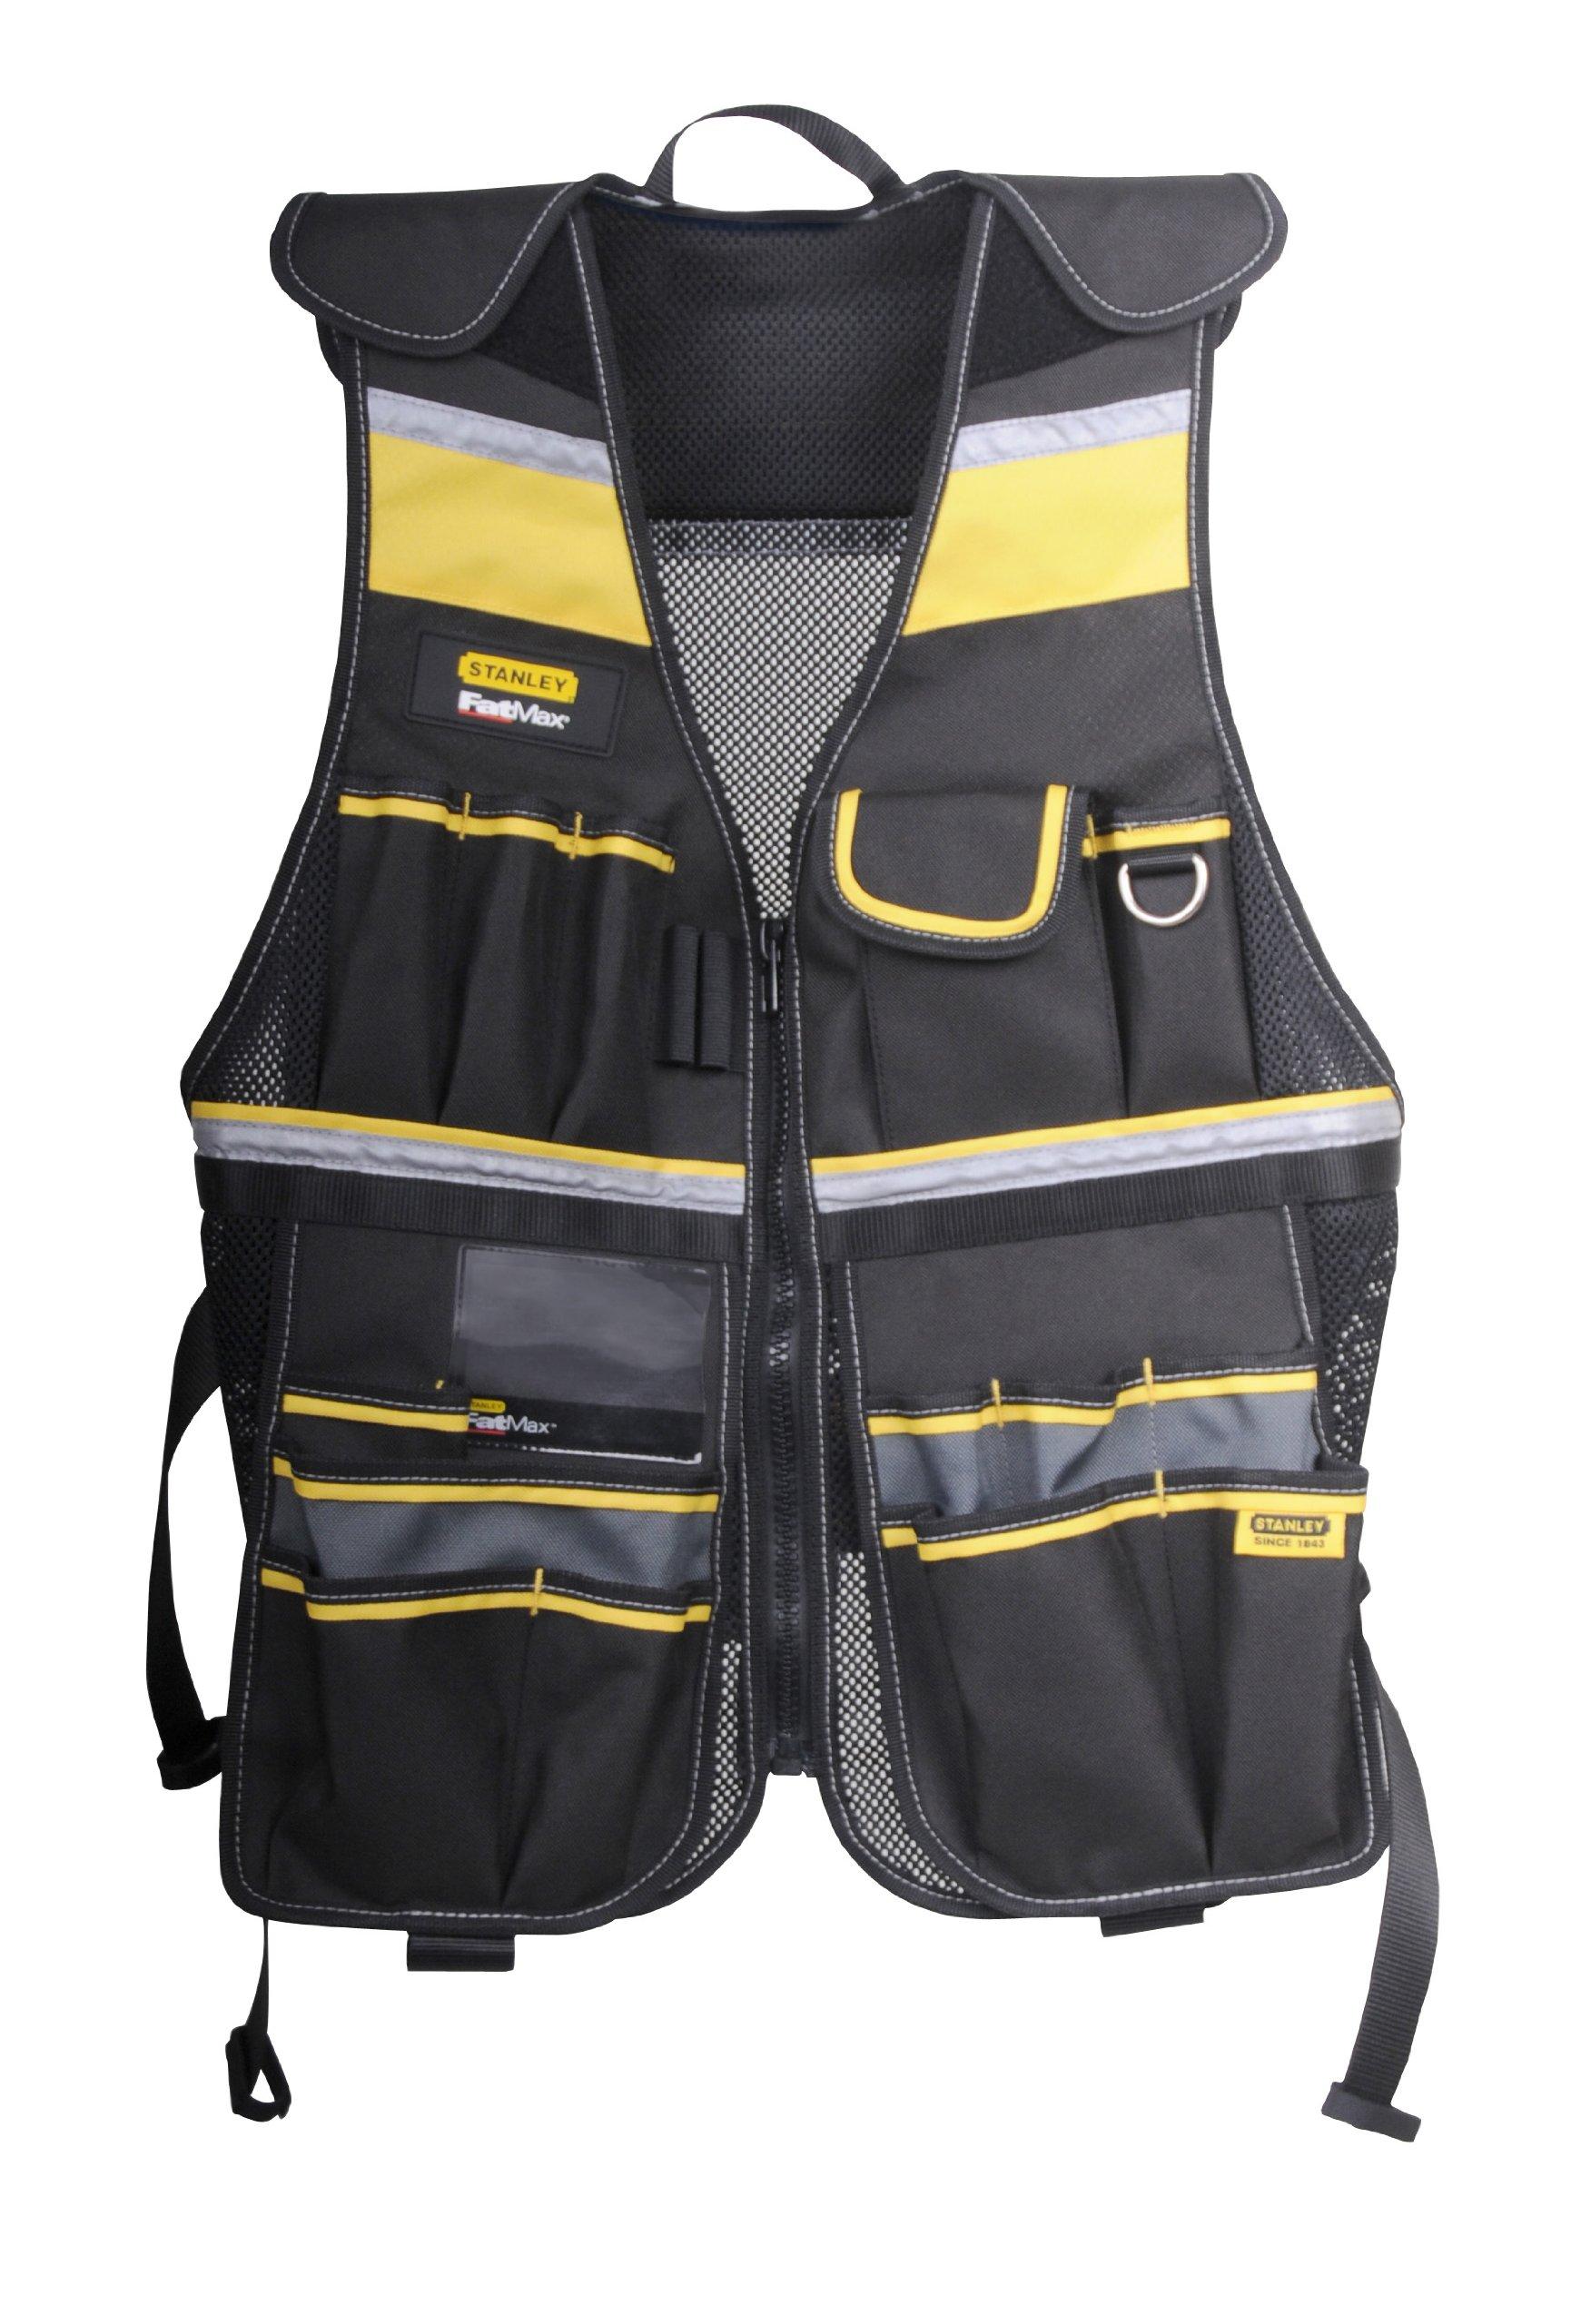 Stanley FMST530201 Fatmax Tool Vest by Stanley (Image #1)